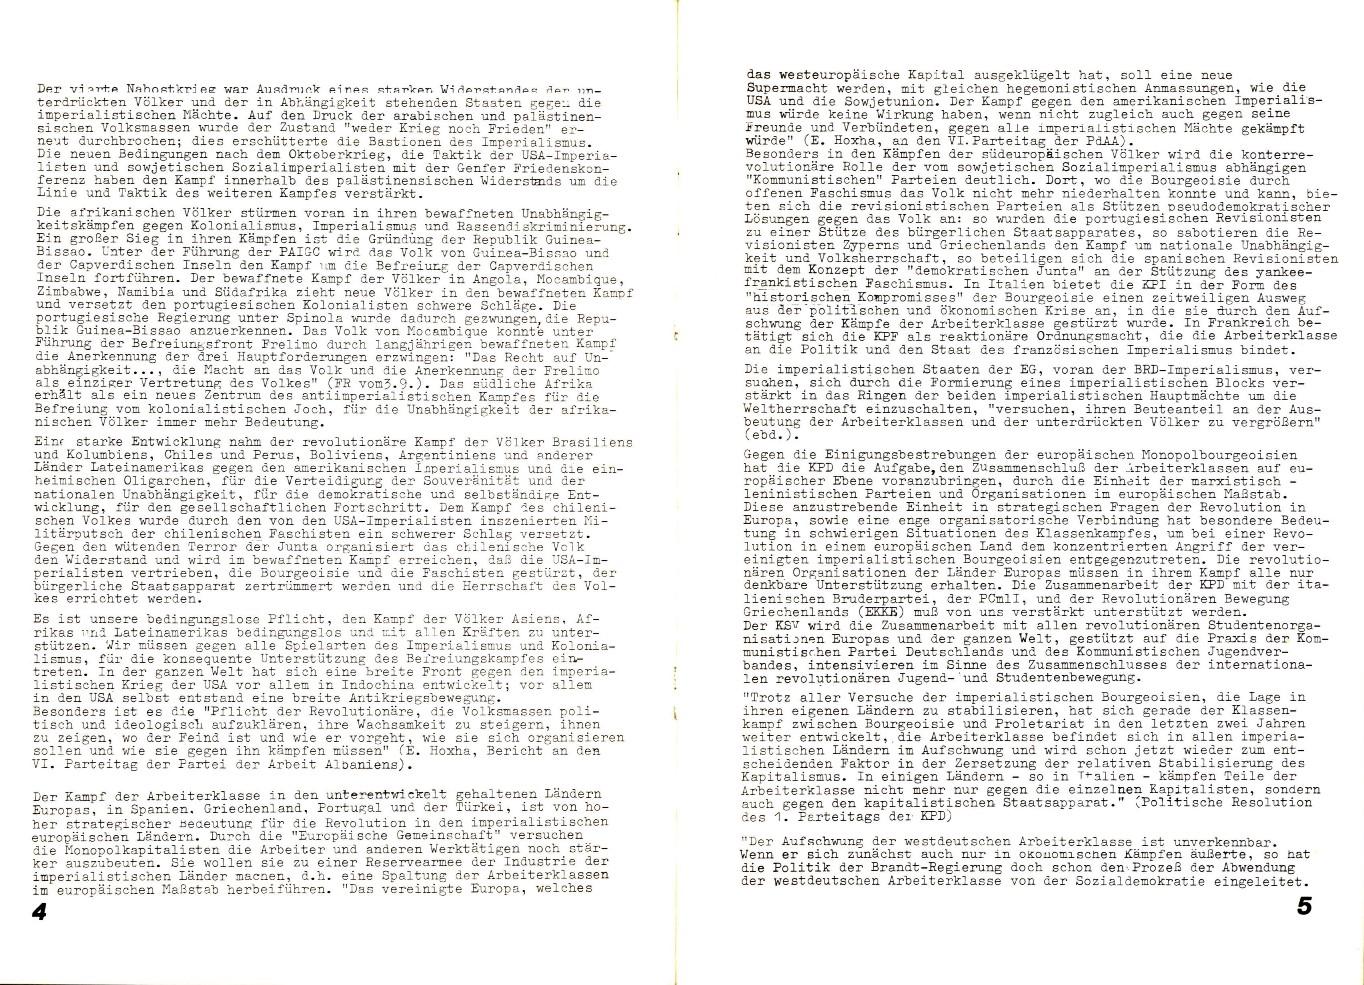 KSV_1974_Rechenschaftsbericht_04